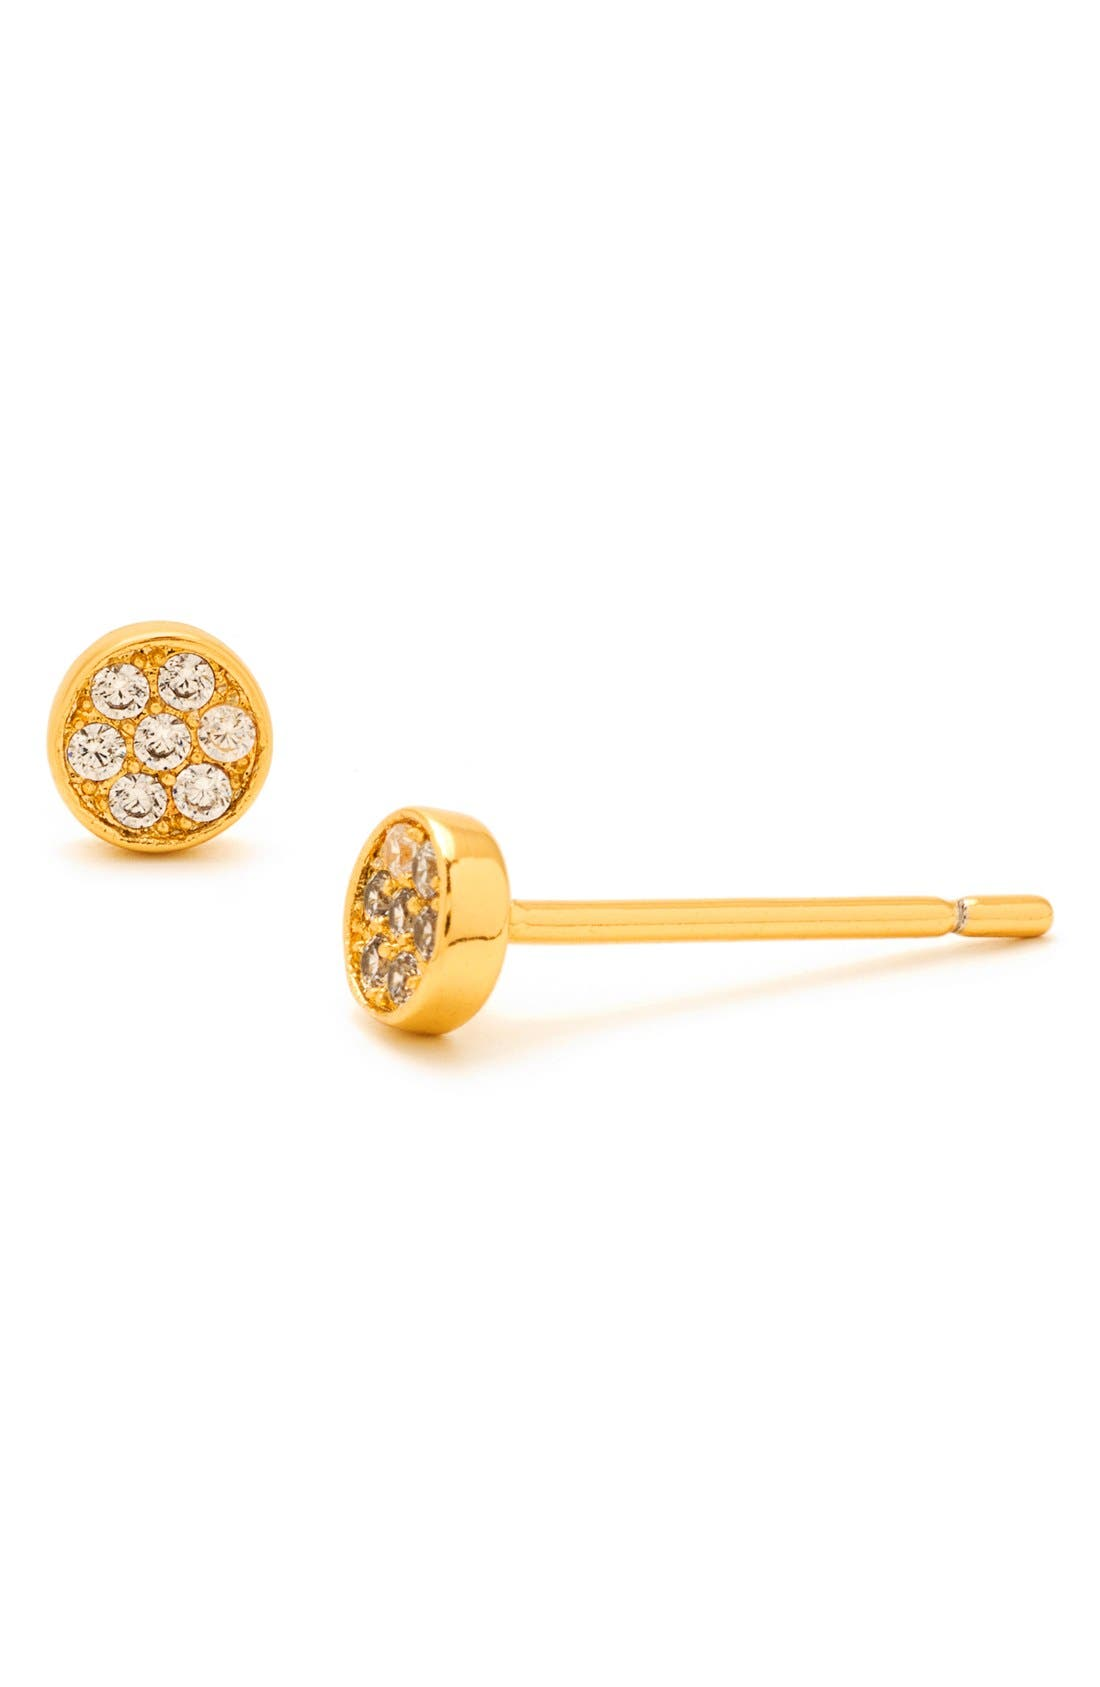 gorjana 'Pristine' Cubic Zirconia Stud Earrings